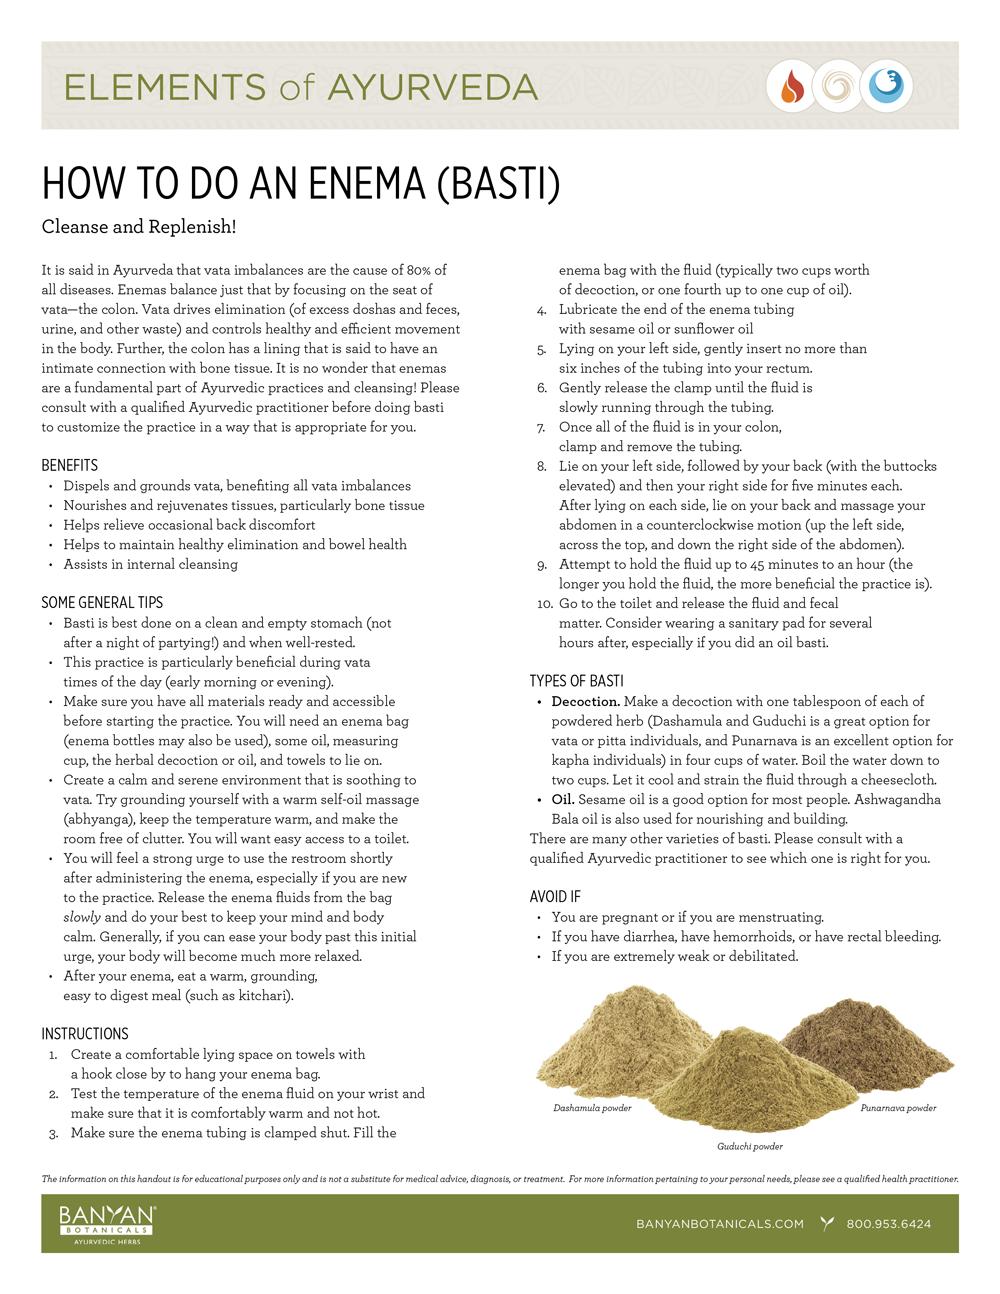 Elements of Ayurveda Handout: How to Do an Enema (Basti)